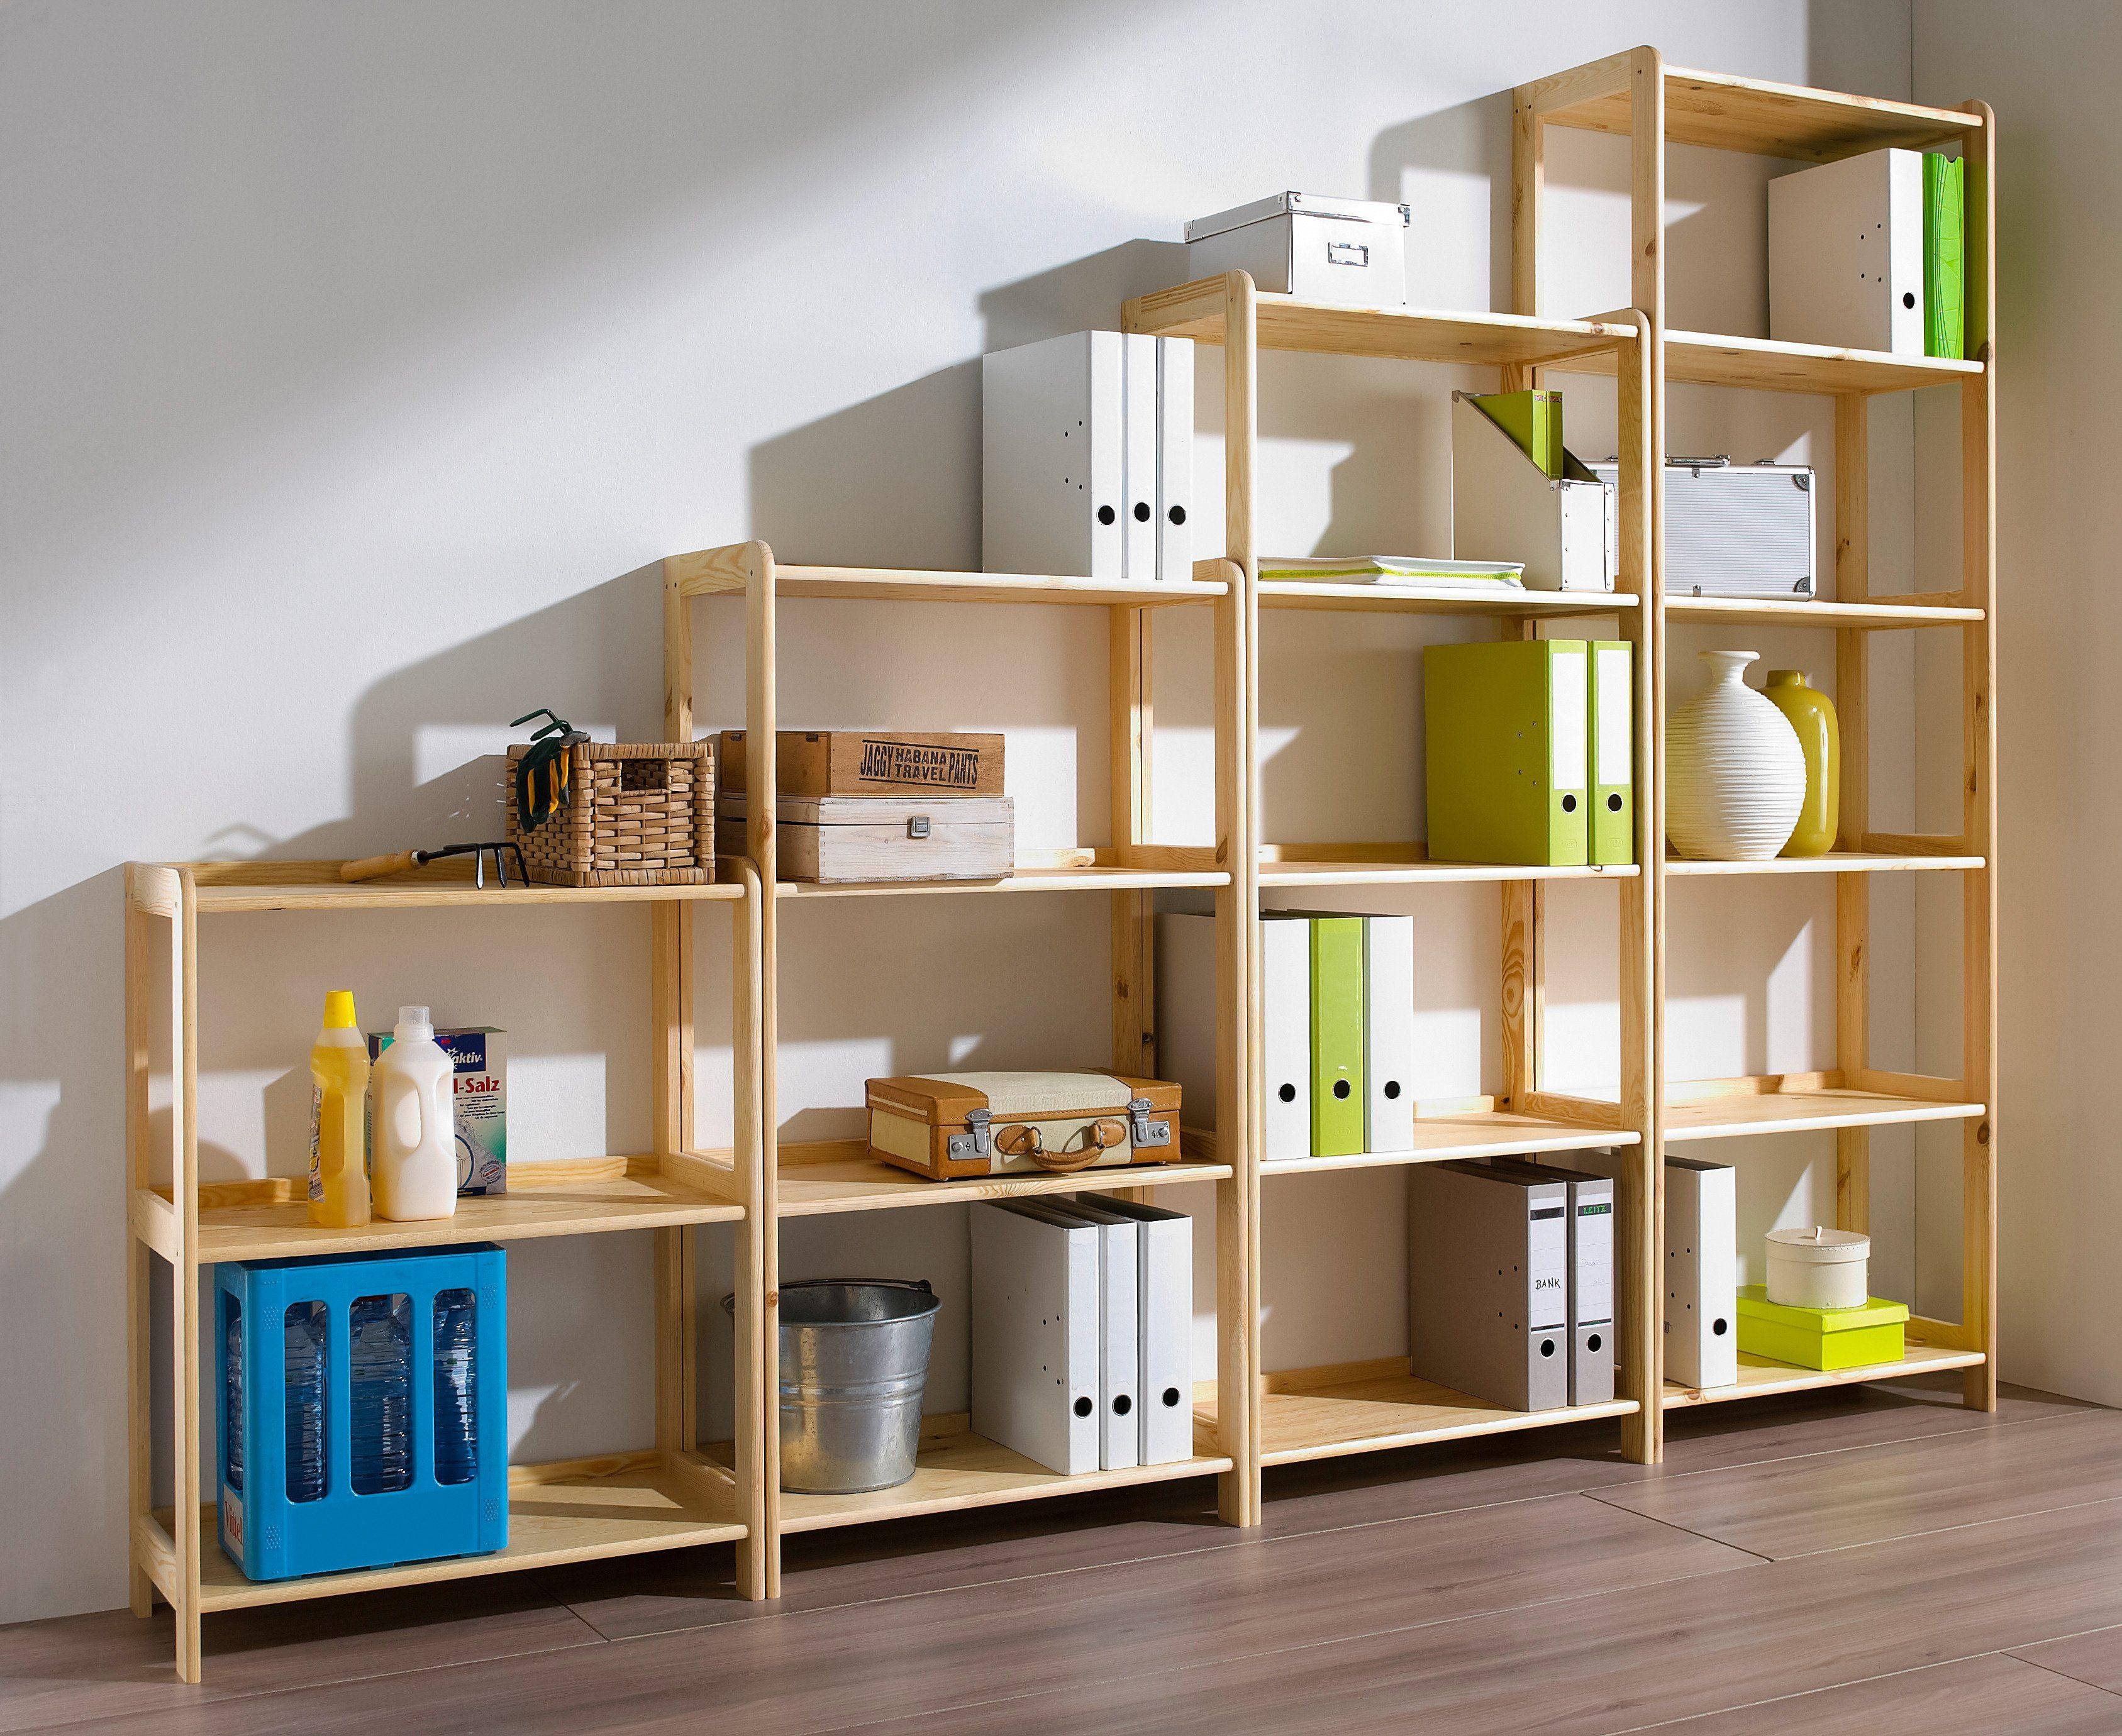 Houten Stellingkast Badkamer : Houten open kast badkamer stijlvolle badkamer ideeën op makeover